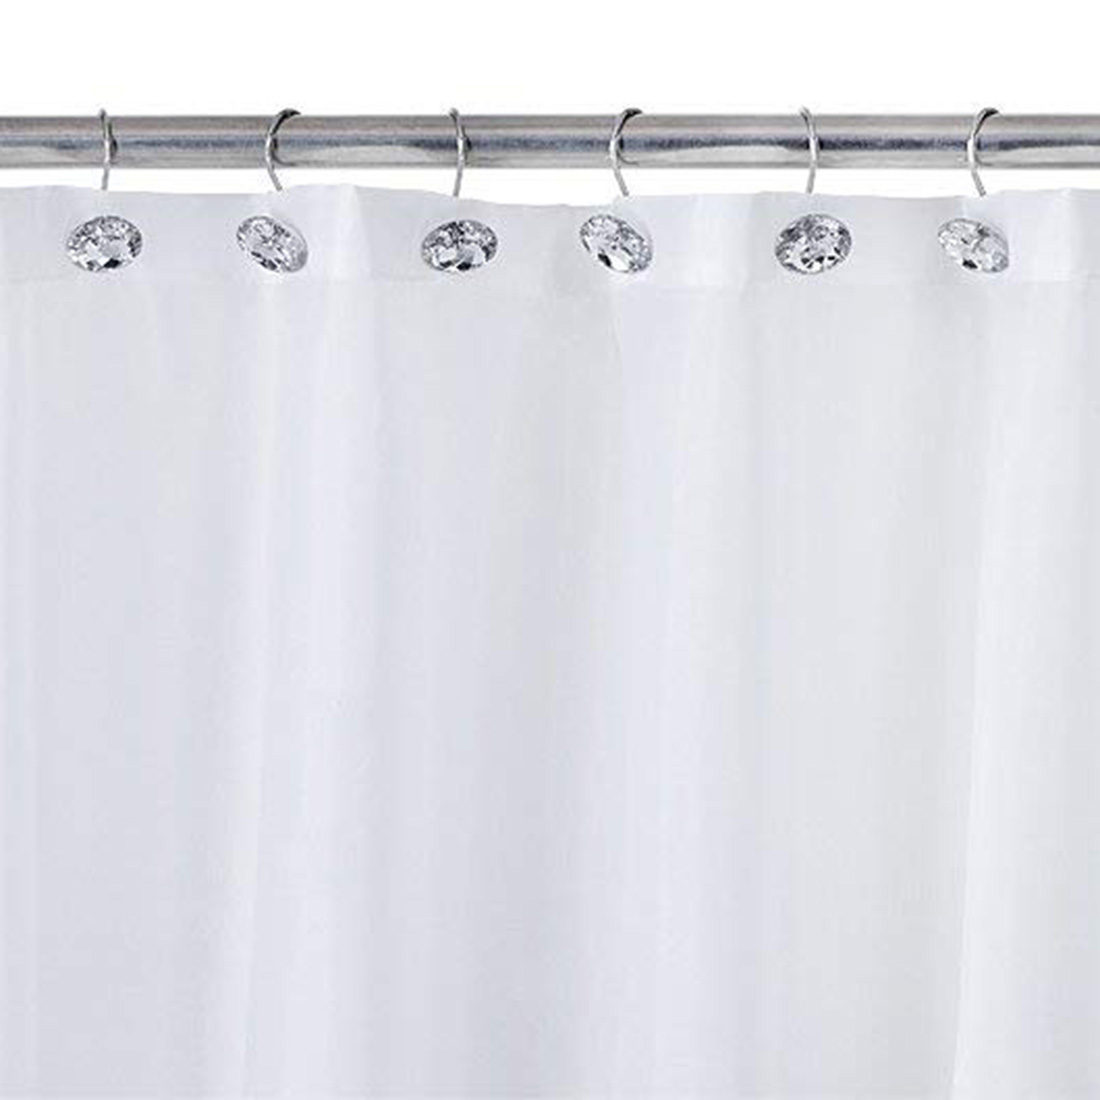 Shower curtain Bling hooks Rings Acrylic Decorative Rhinestones Glass Crystal Rolling Bathroom Bath Set of 12 Rings|Bathroom Hooks| |  - title=